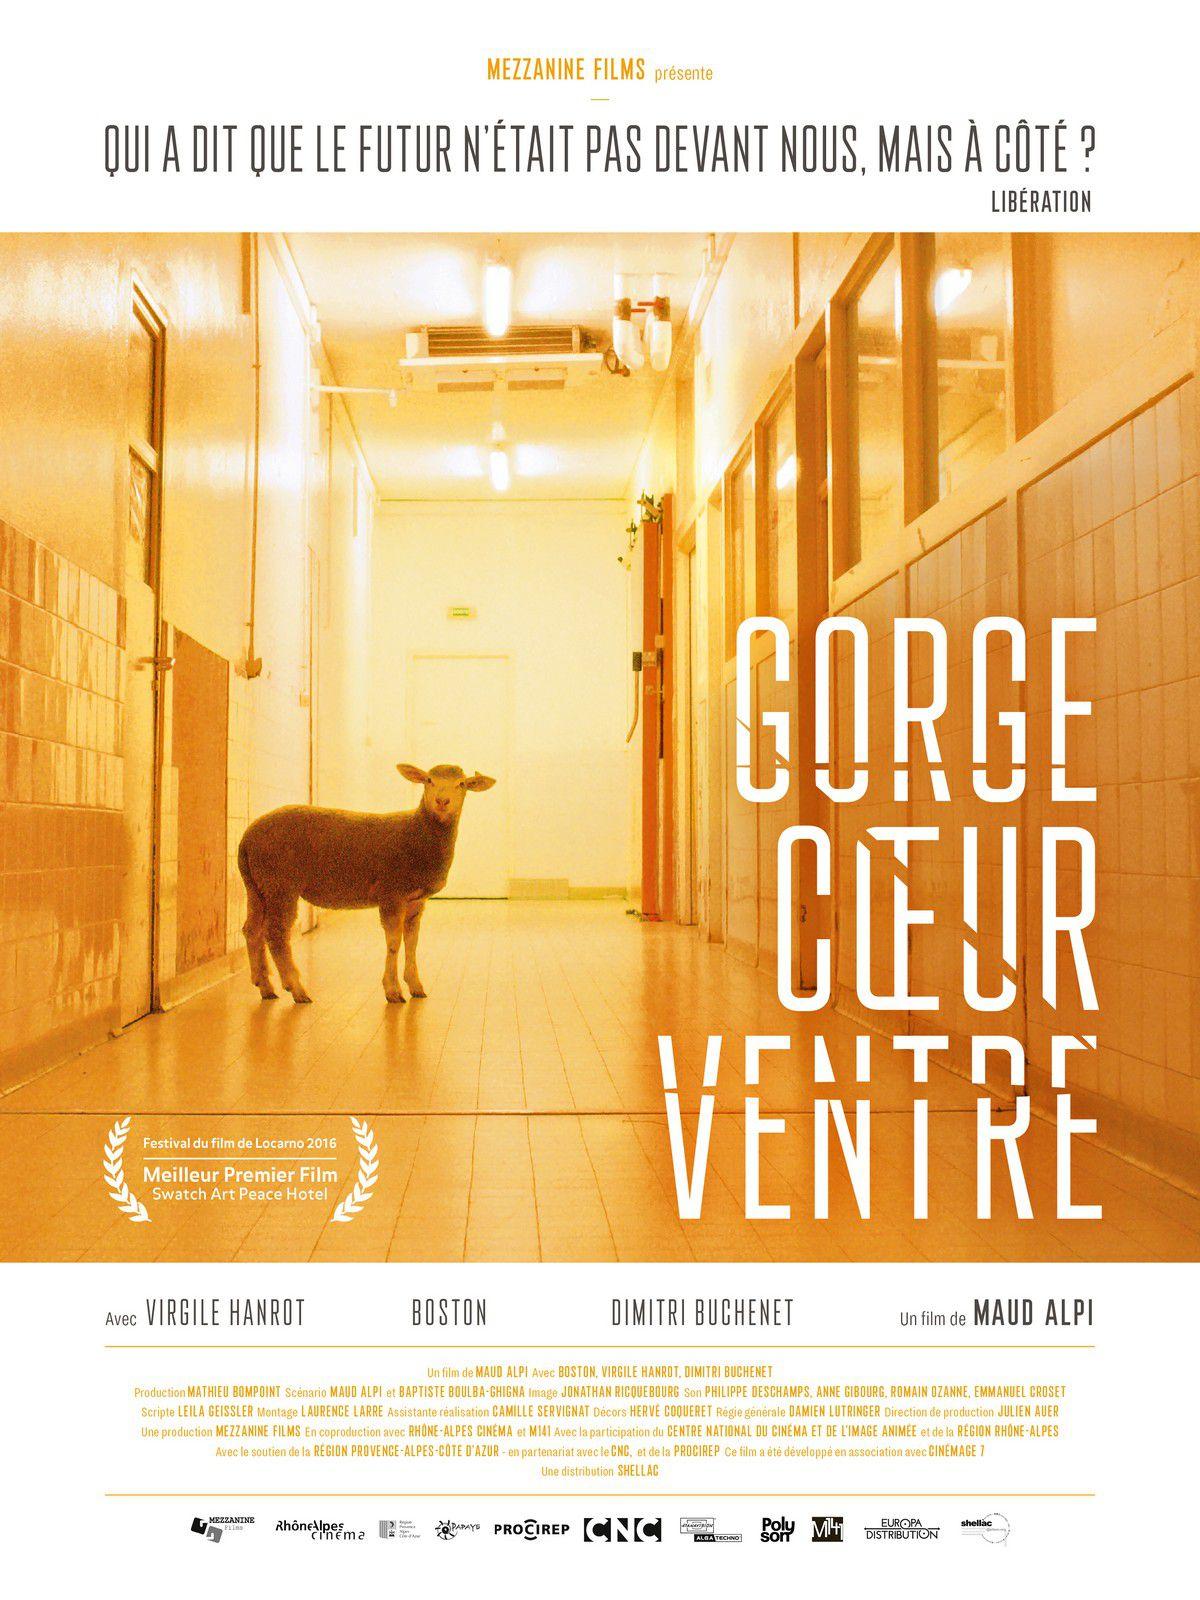 Gorge coeur ventre - Film (2016)